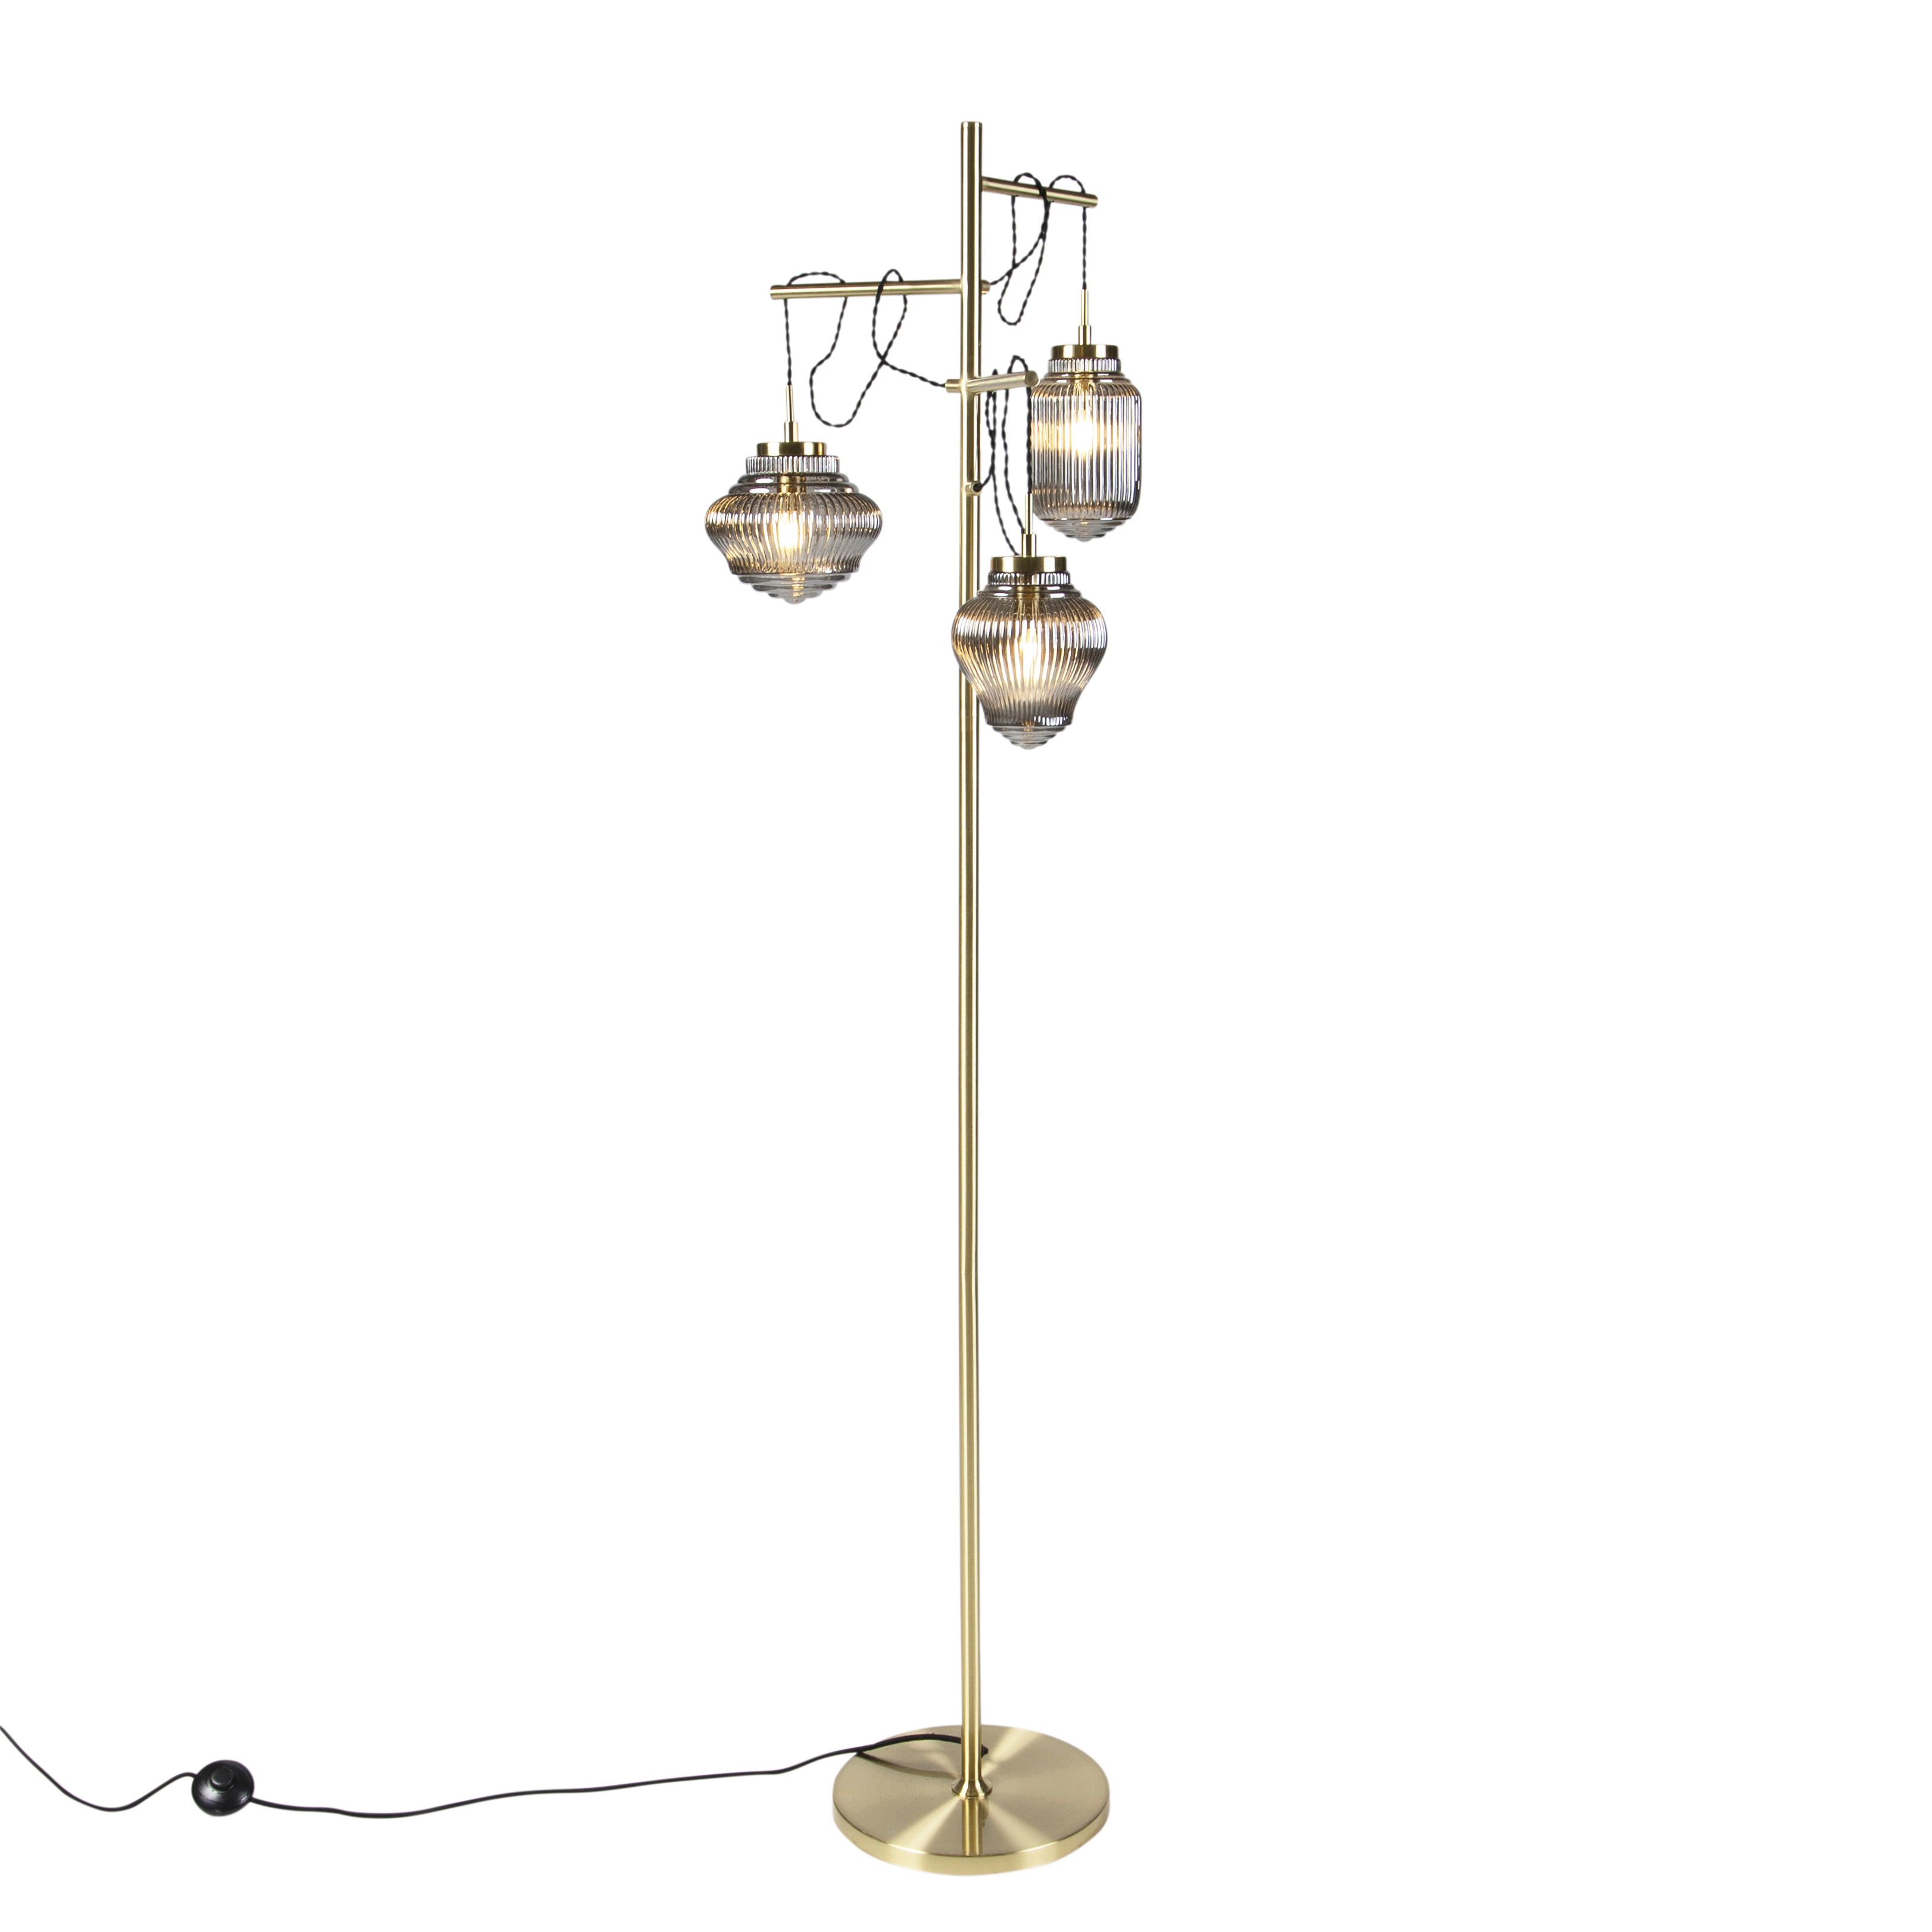 Art deco vloerlamp messing met smoke glas 3-lichts - Bolsena